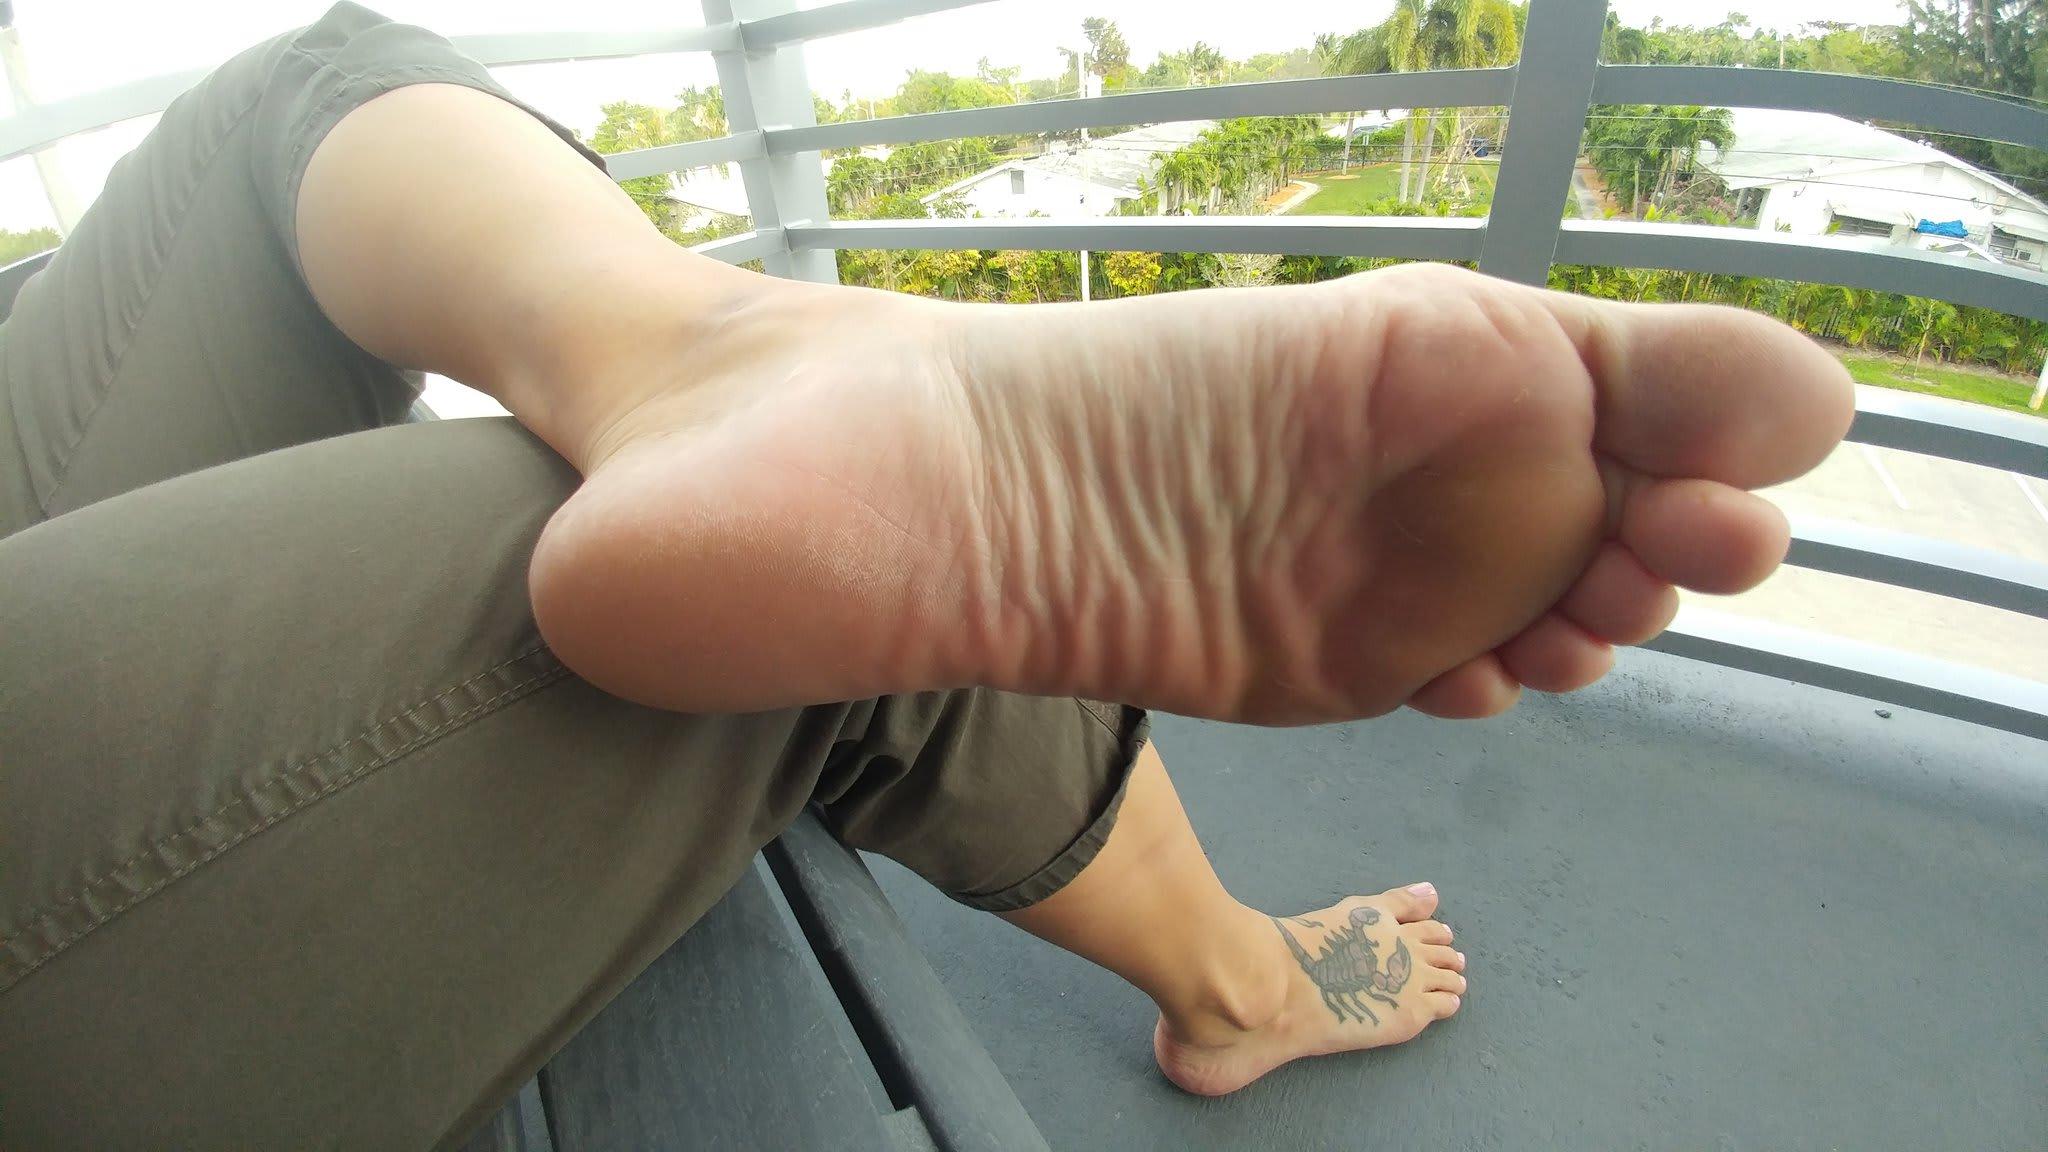 [Image Gallery] Giselle (Online Discipline) Feet | Berlin Feet